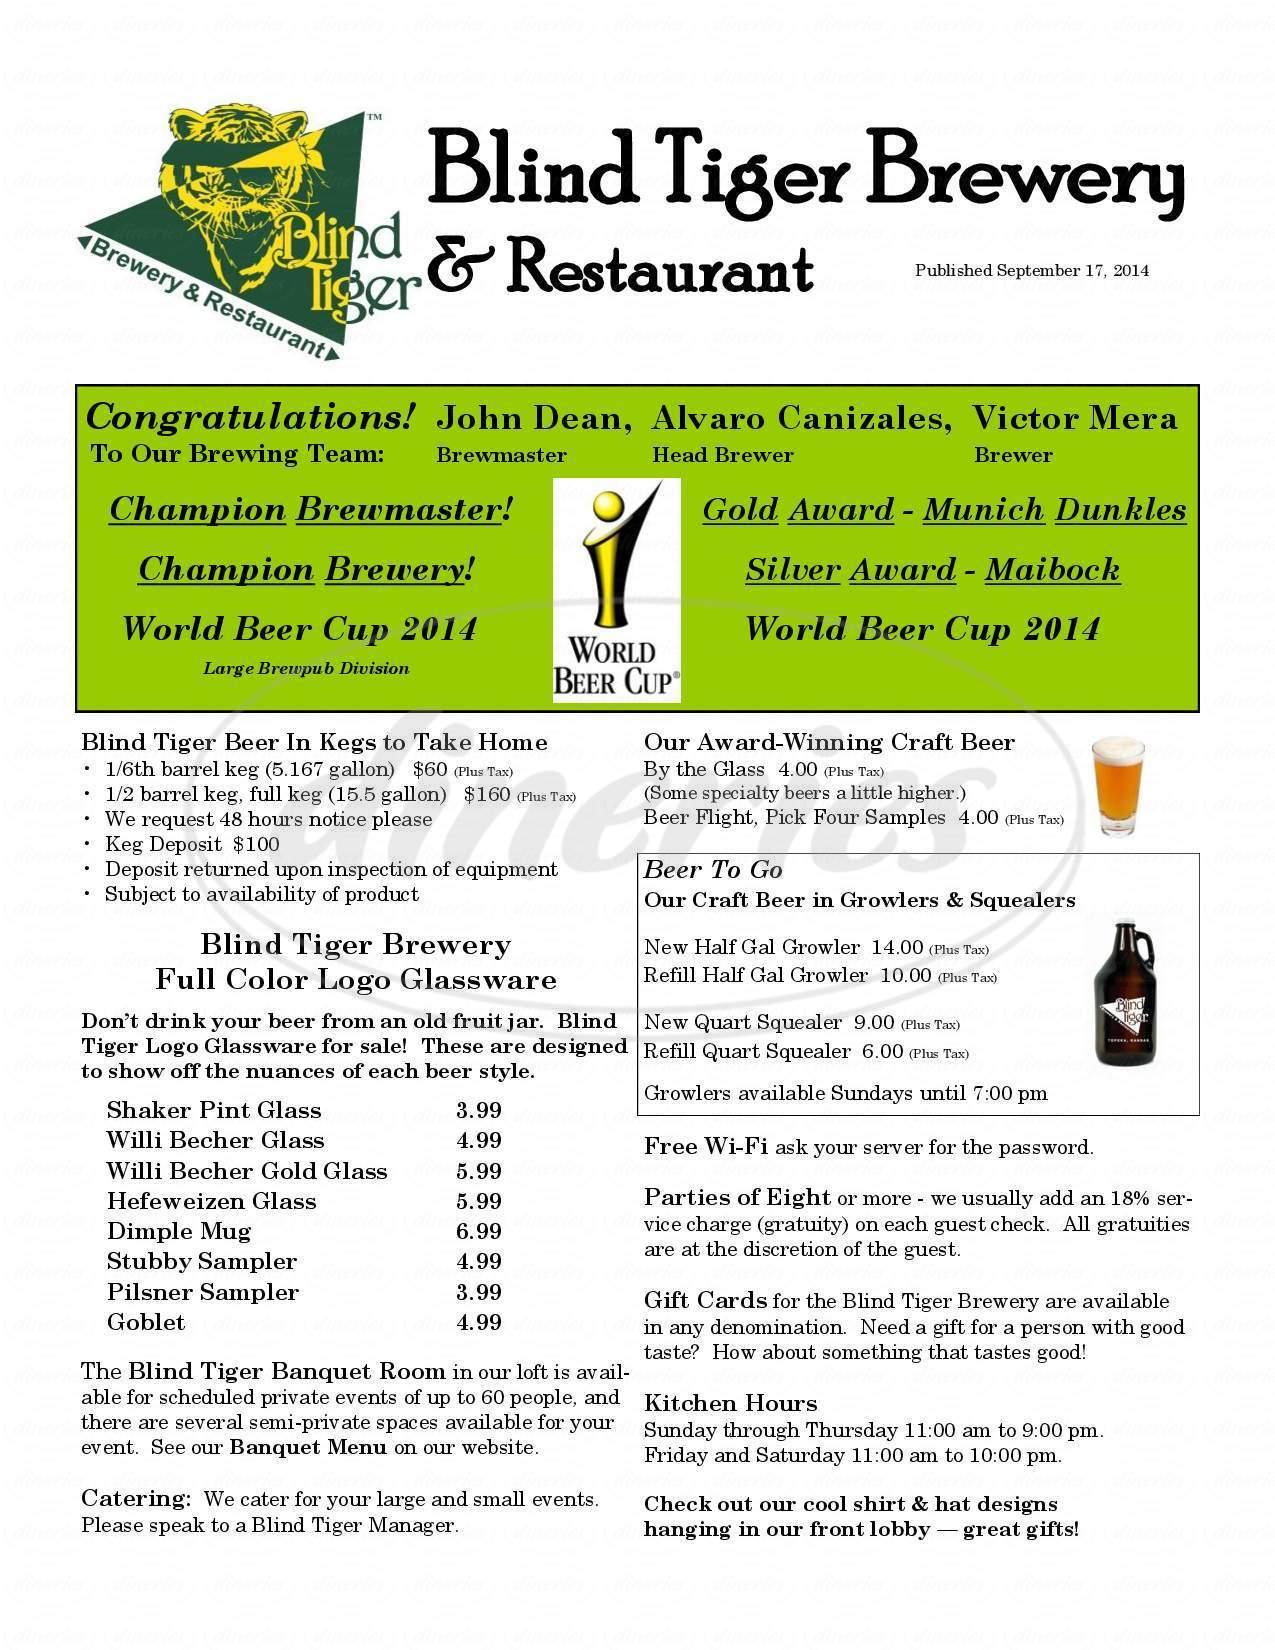 menu for Blind Tiger Brewery & Restaurant